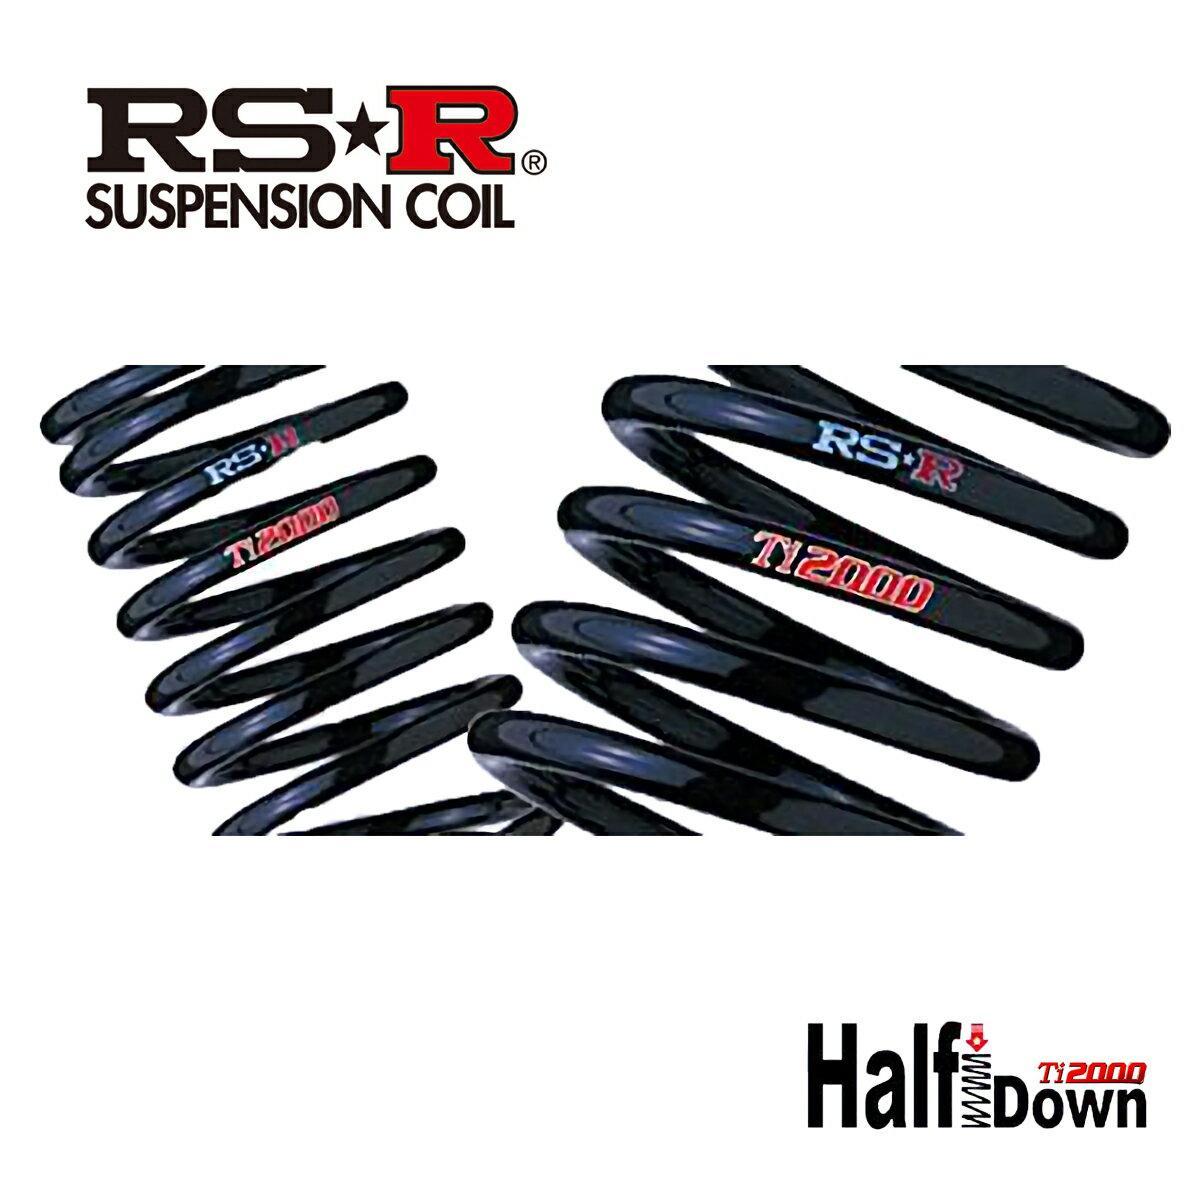 RS-R エスクァイア 4WD ZWR80G ダウンサス スプリング リアのみ T935THDR Ti2000 ハーフダウン RSR 個人宅発送追金有